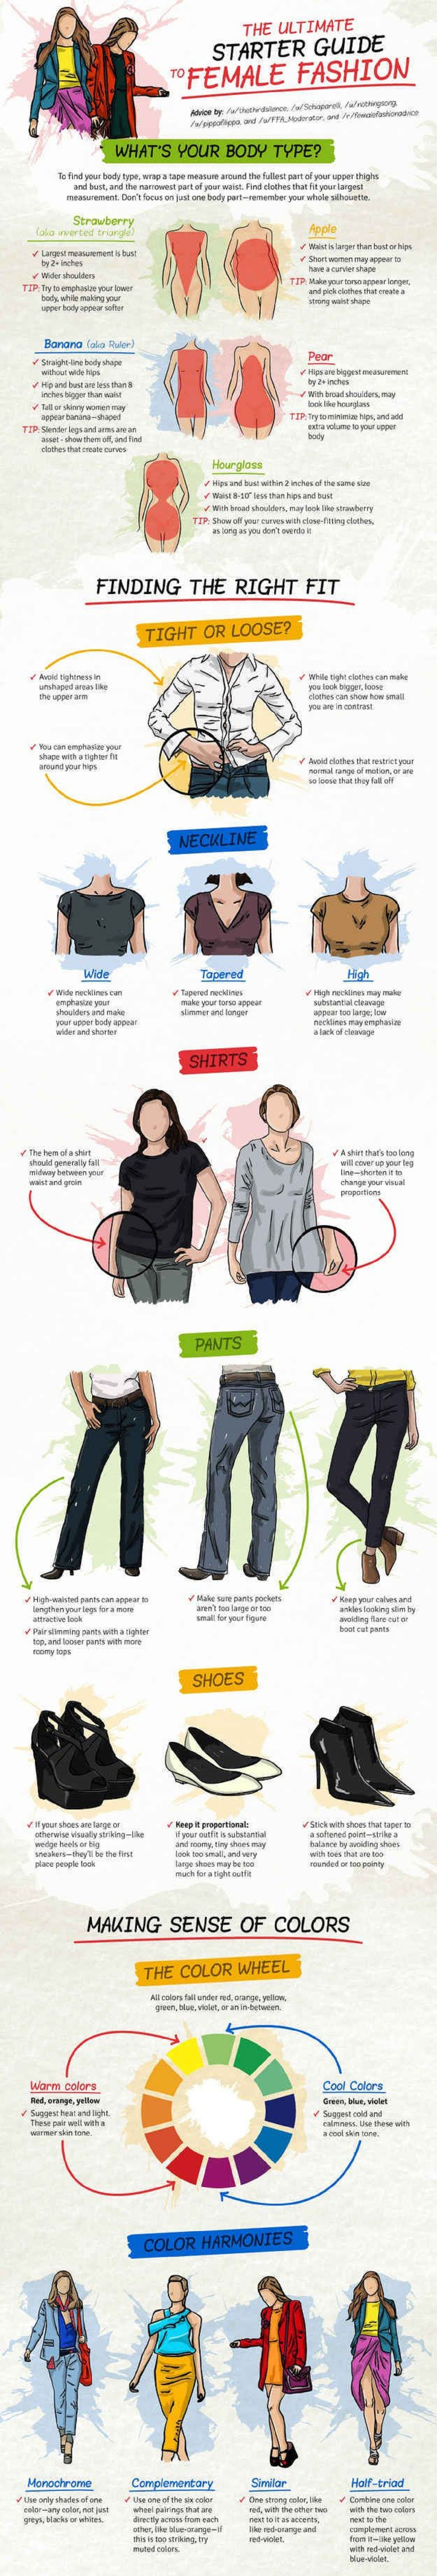 31-insanely-useful-fashion-infographic